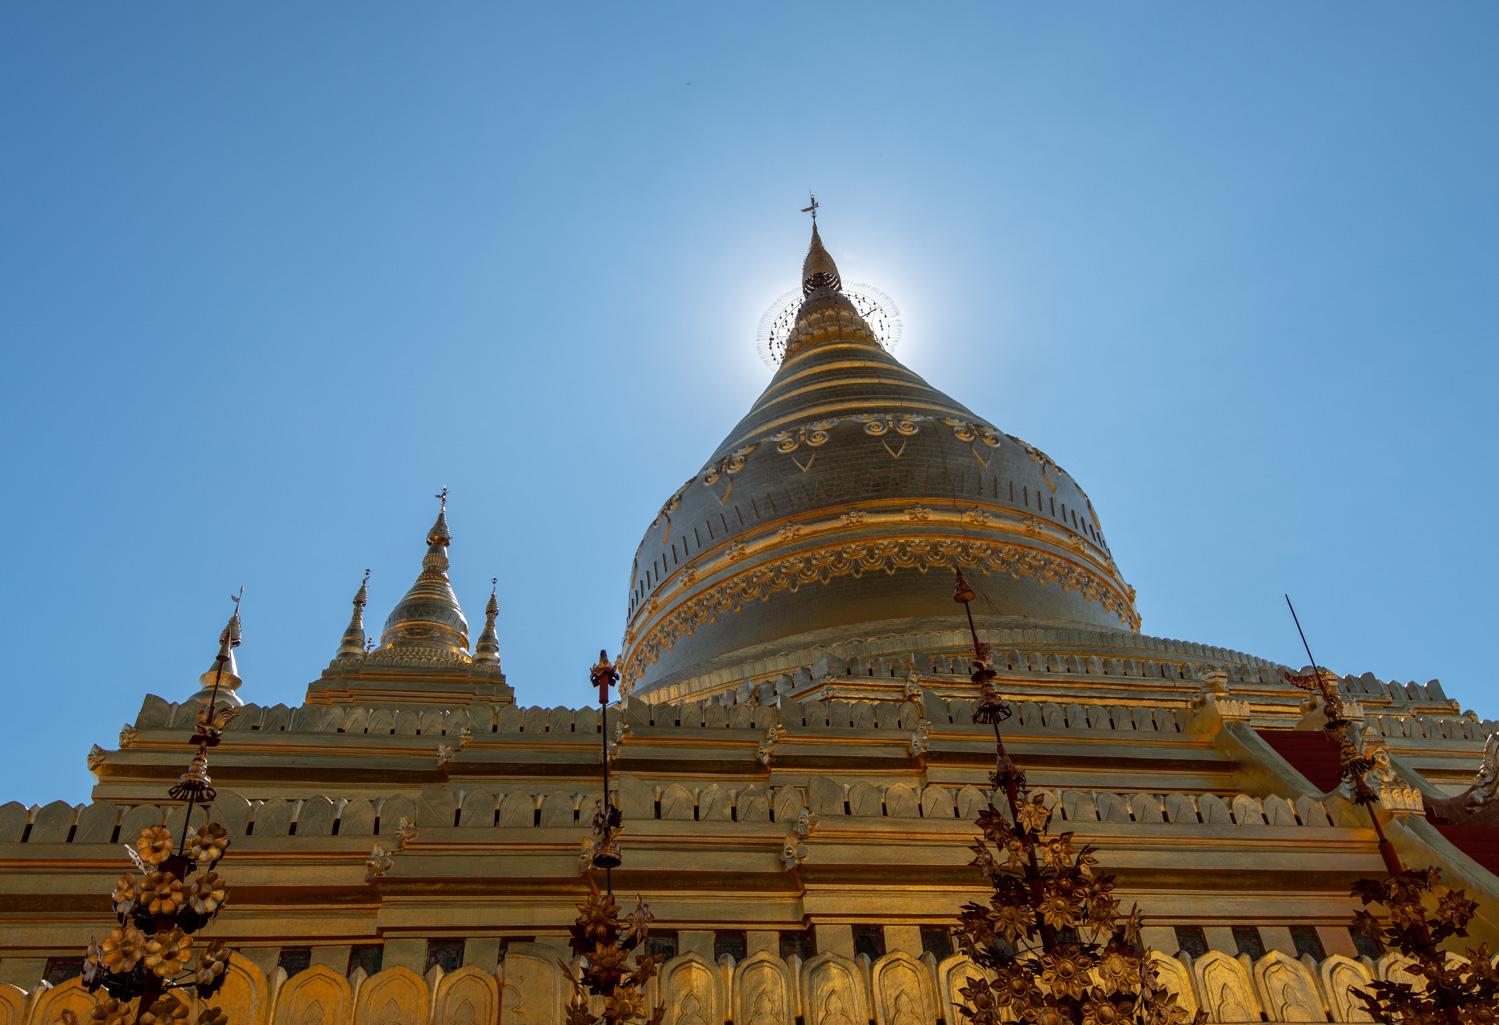 Shwezigon Pagoda's stupa is backlit by the midday sun.